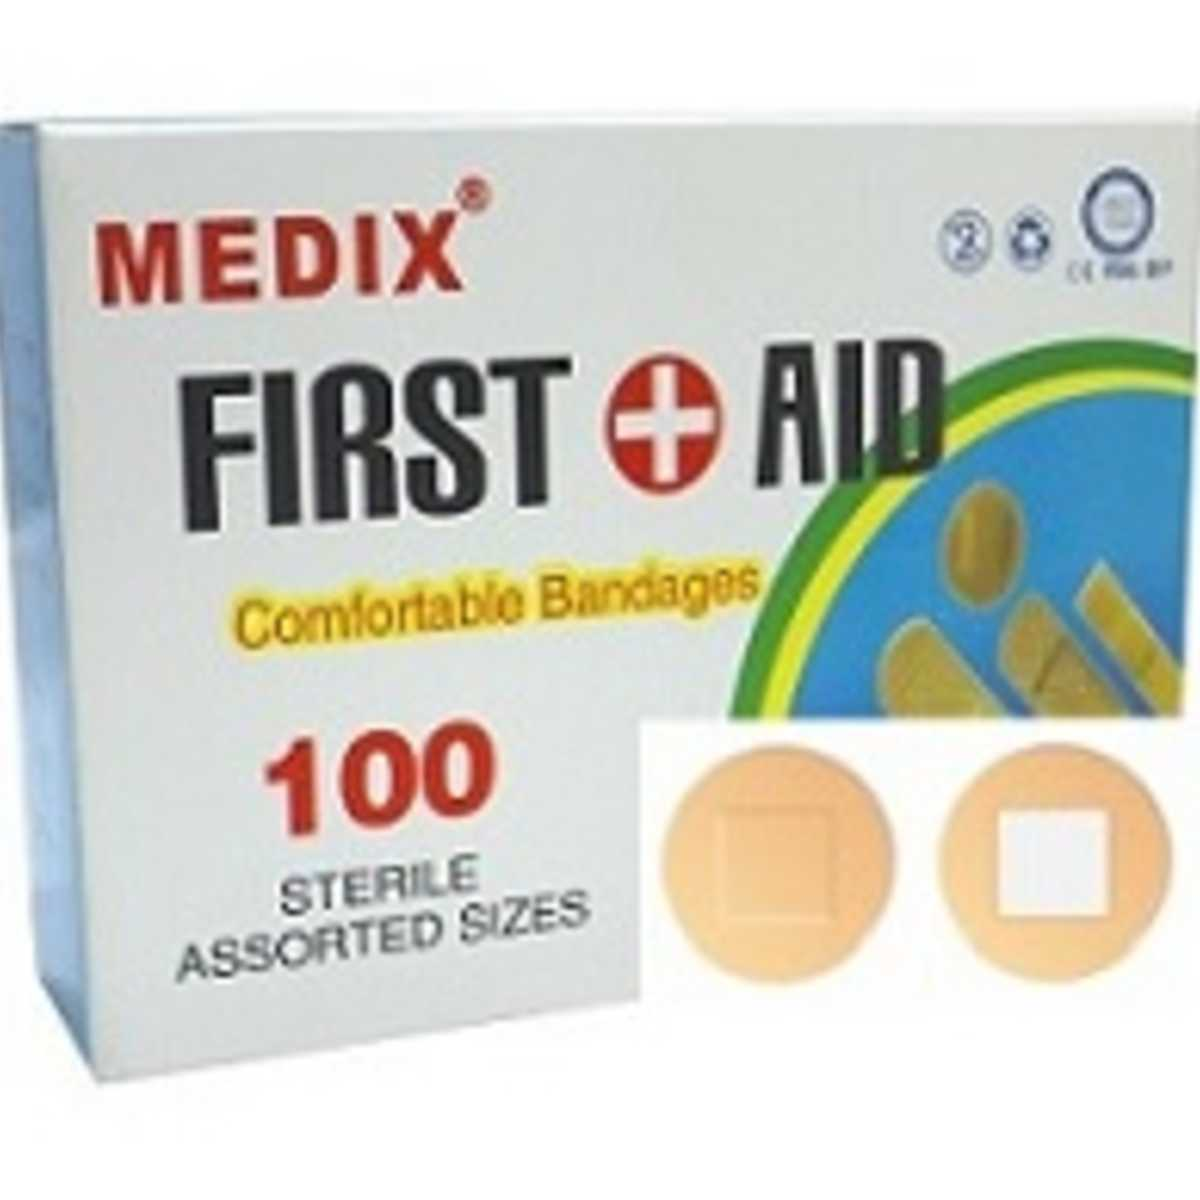 Medi x First Aid Plaster, Round Band-Aid